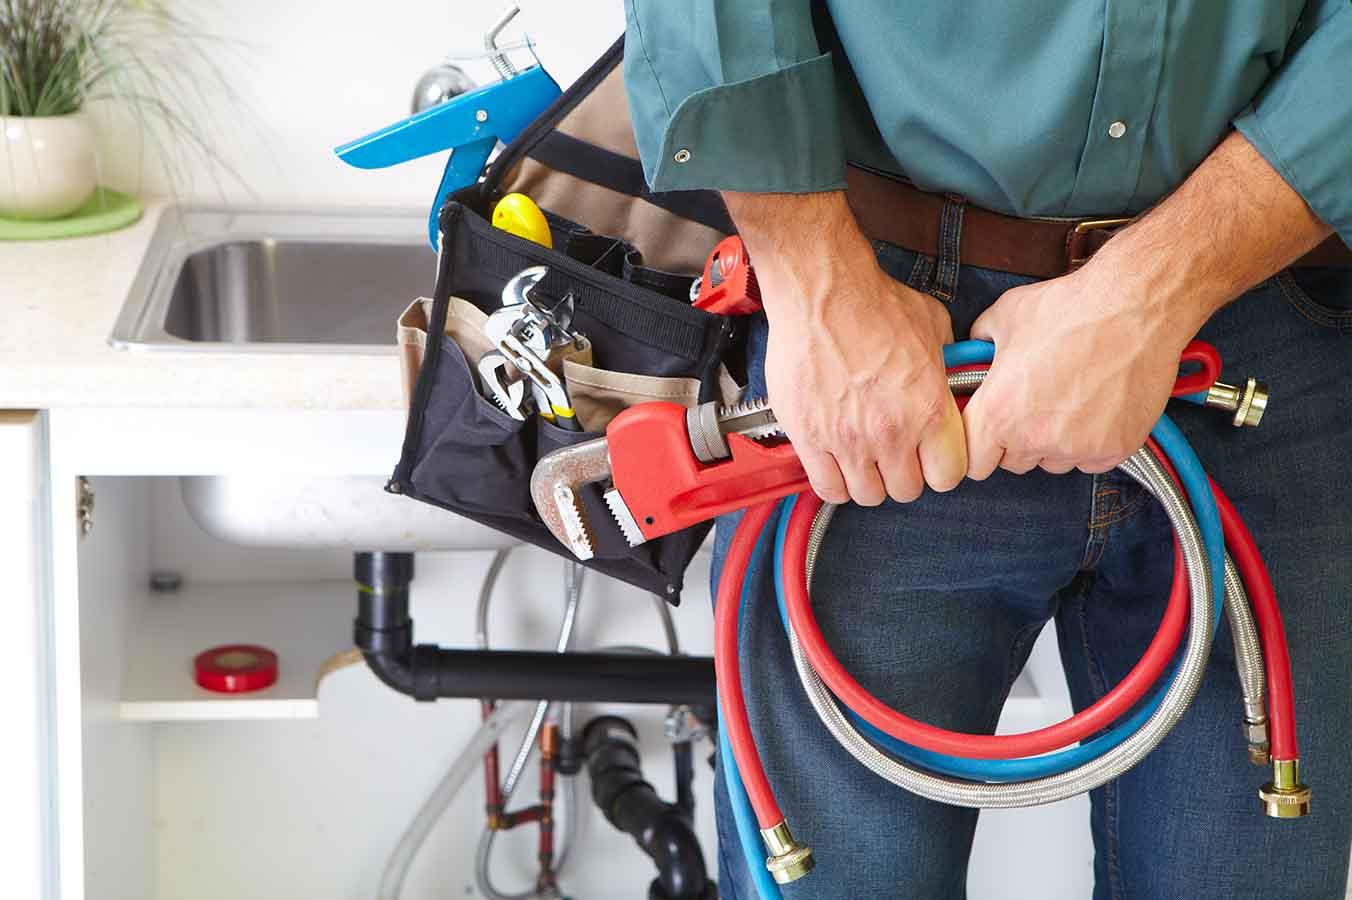 technicien d'entretien en plomberie